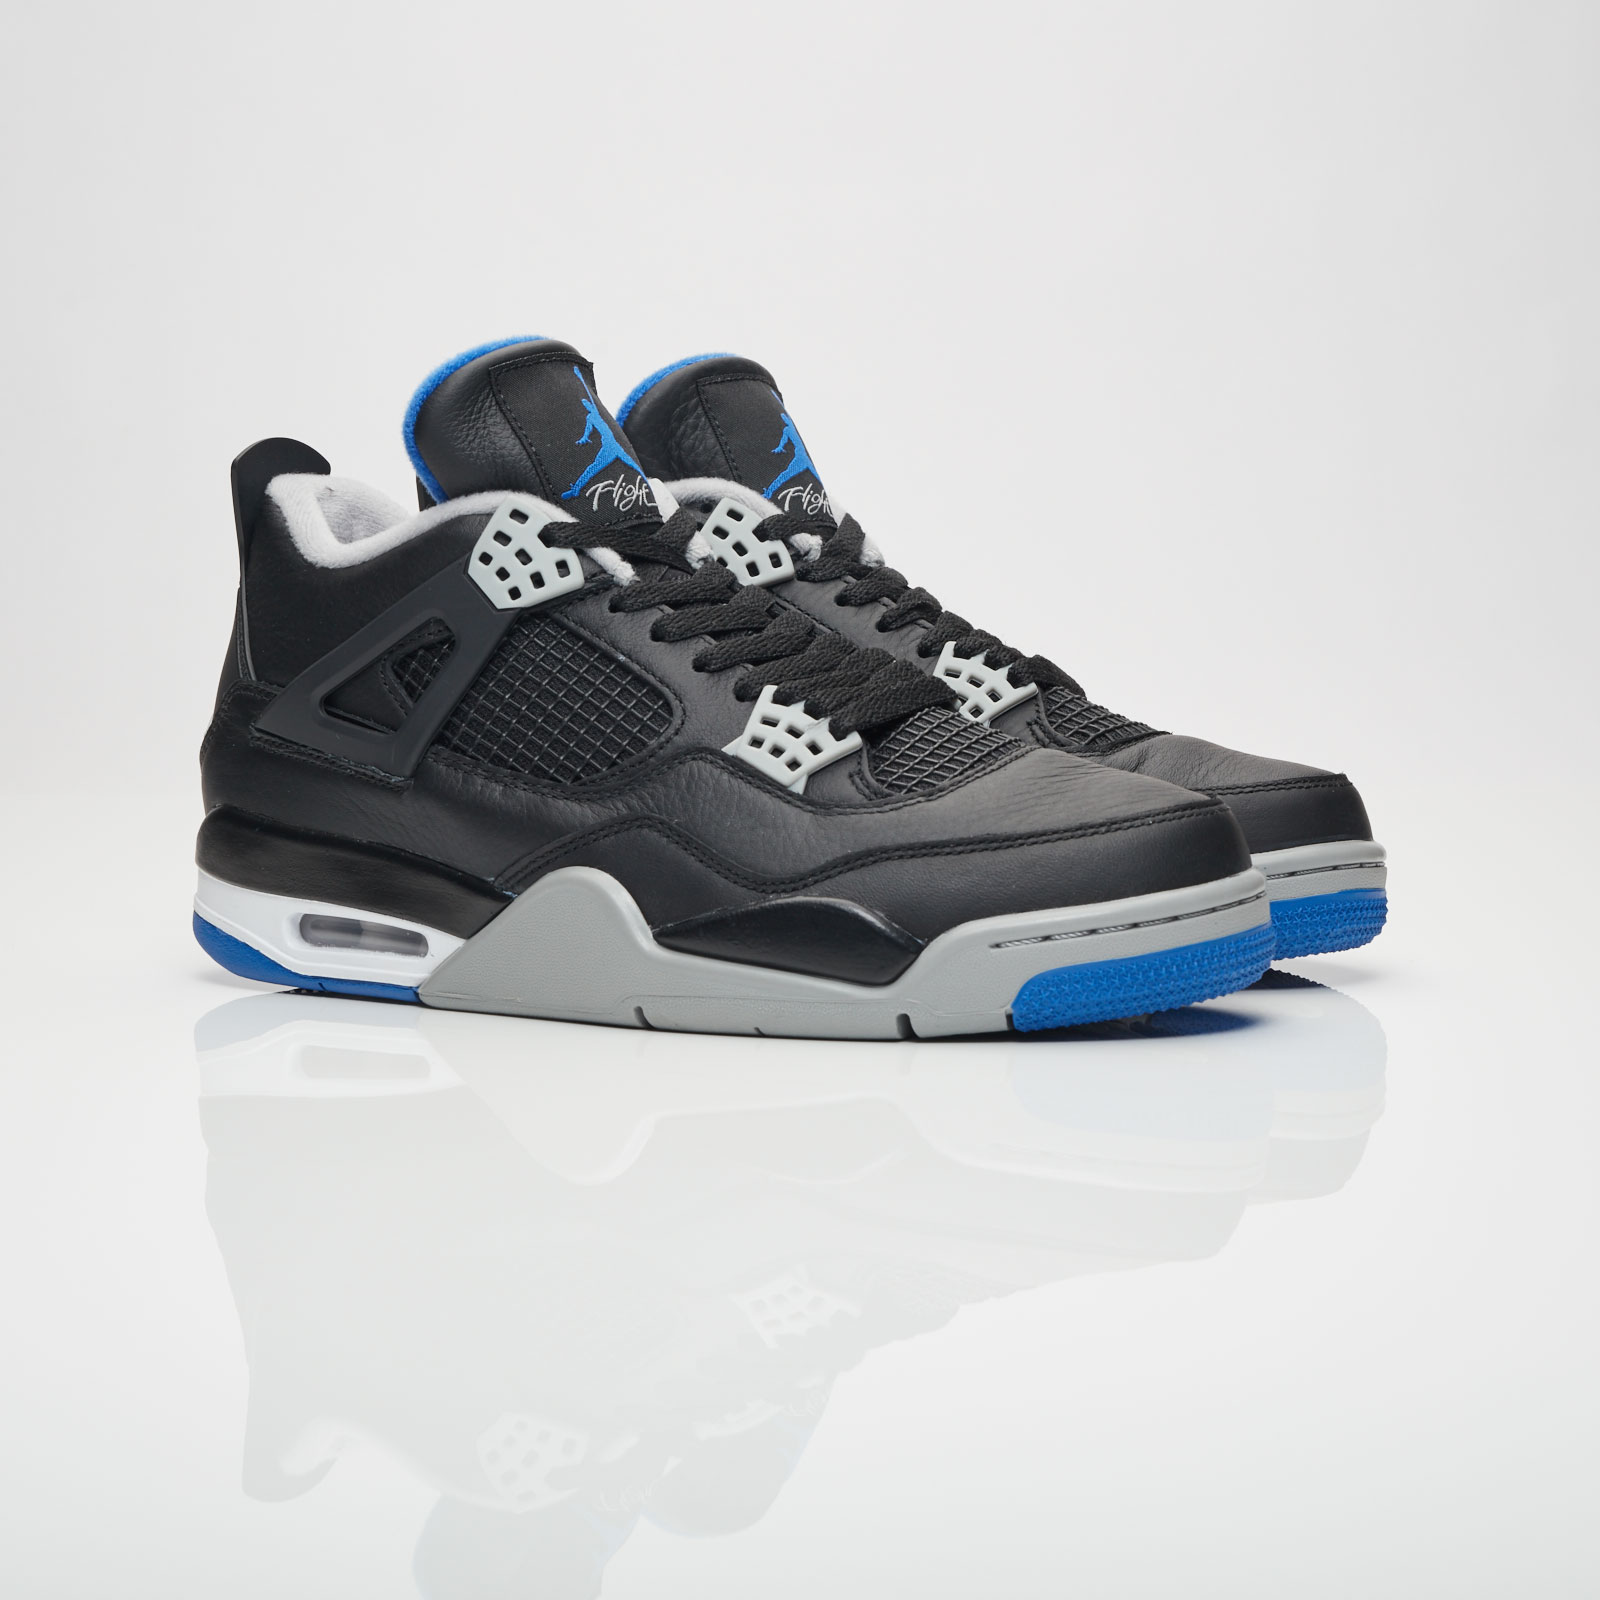 check out 1f261 339db Jordan Brand Air Jordan 4 Retro